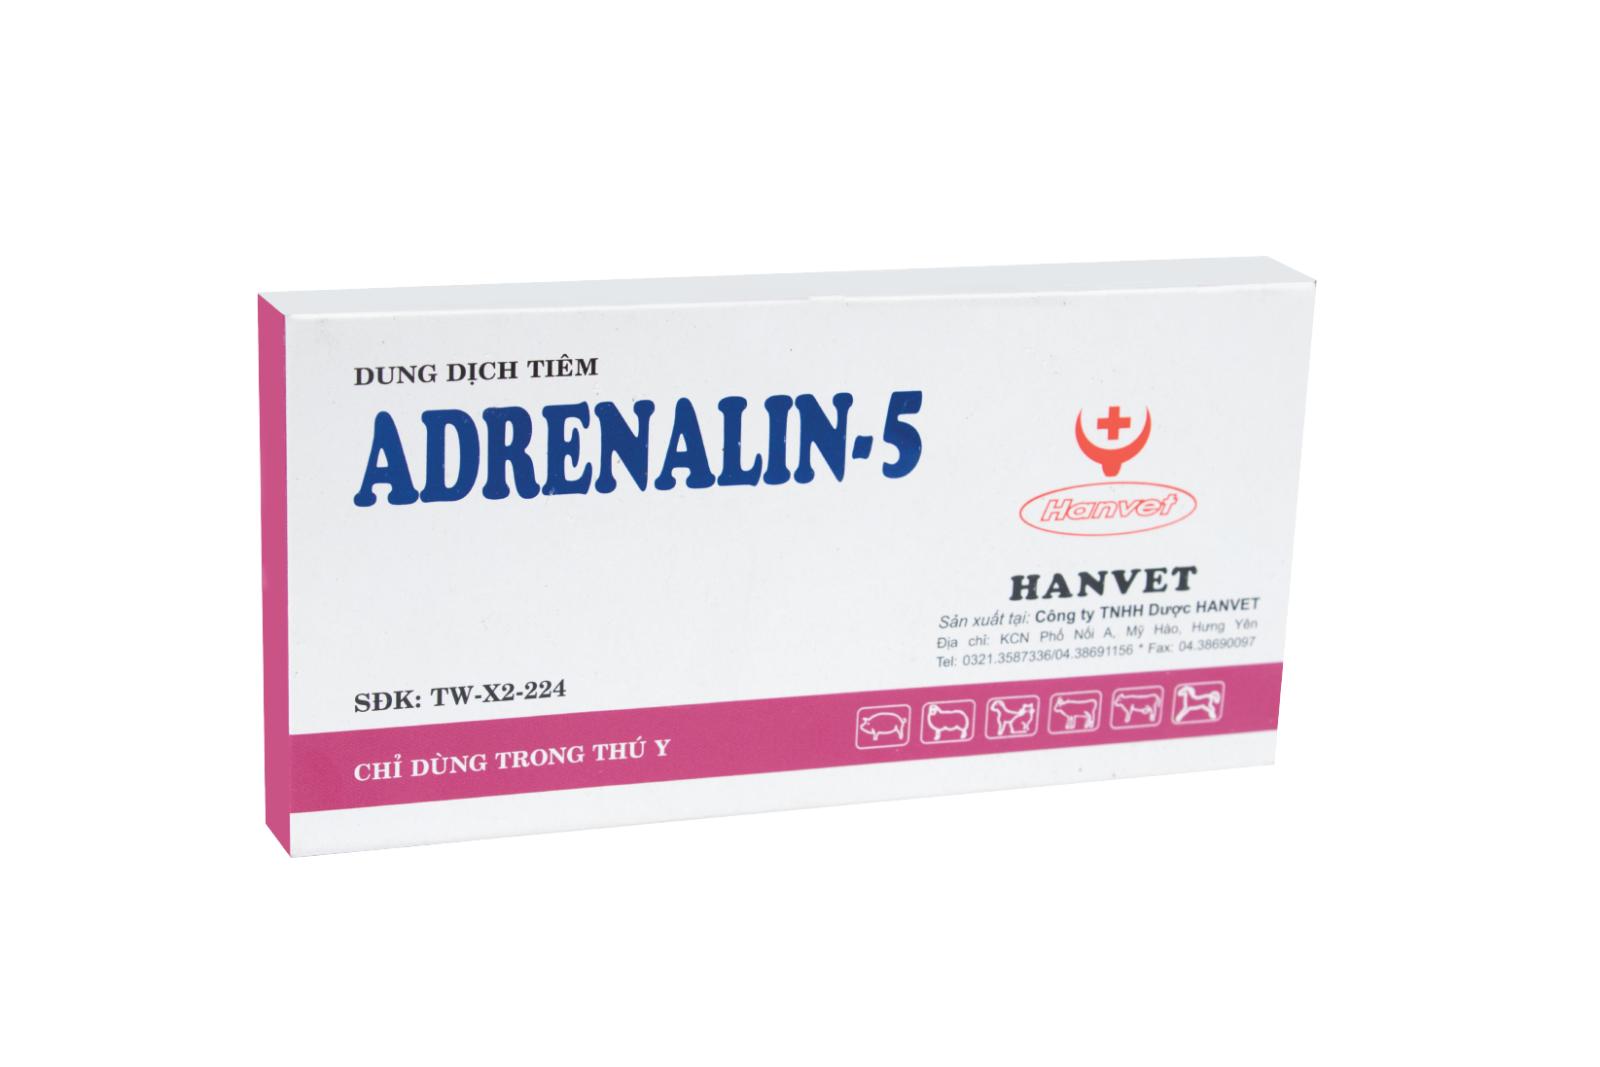 Adrenalin-5